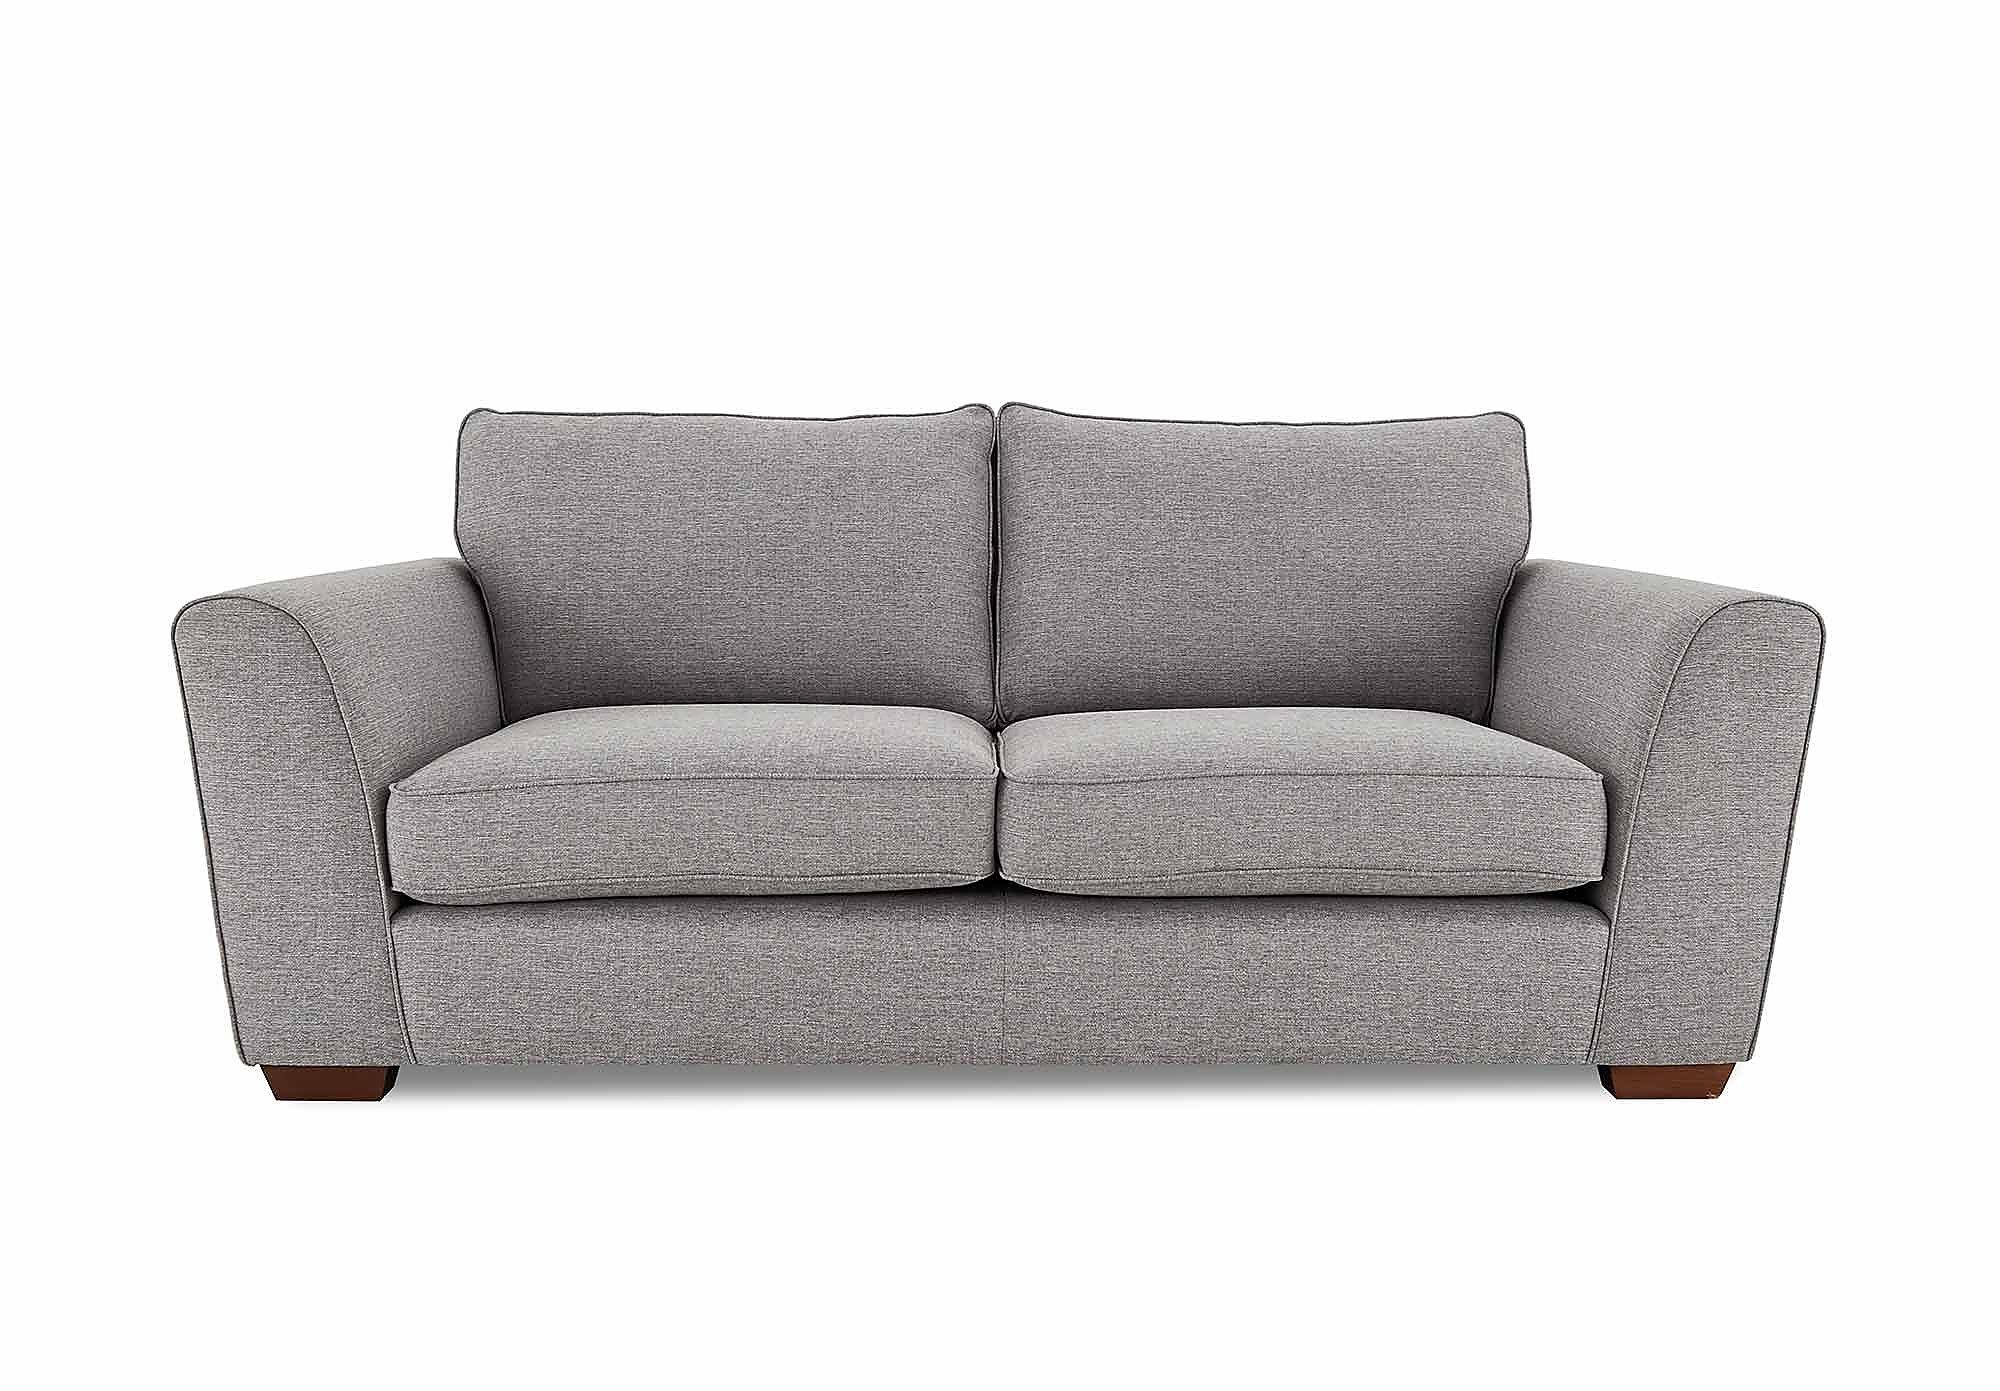 High Street Oxford Street 3 Seater Fabric Sofa Bed Furniture Village